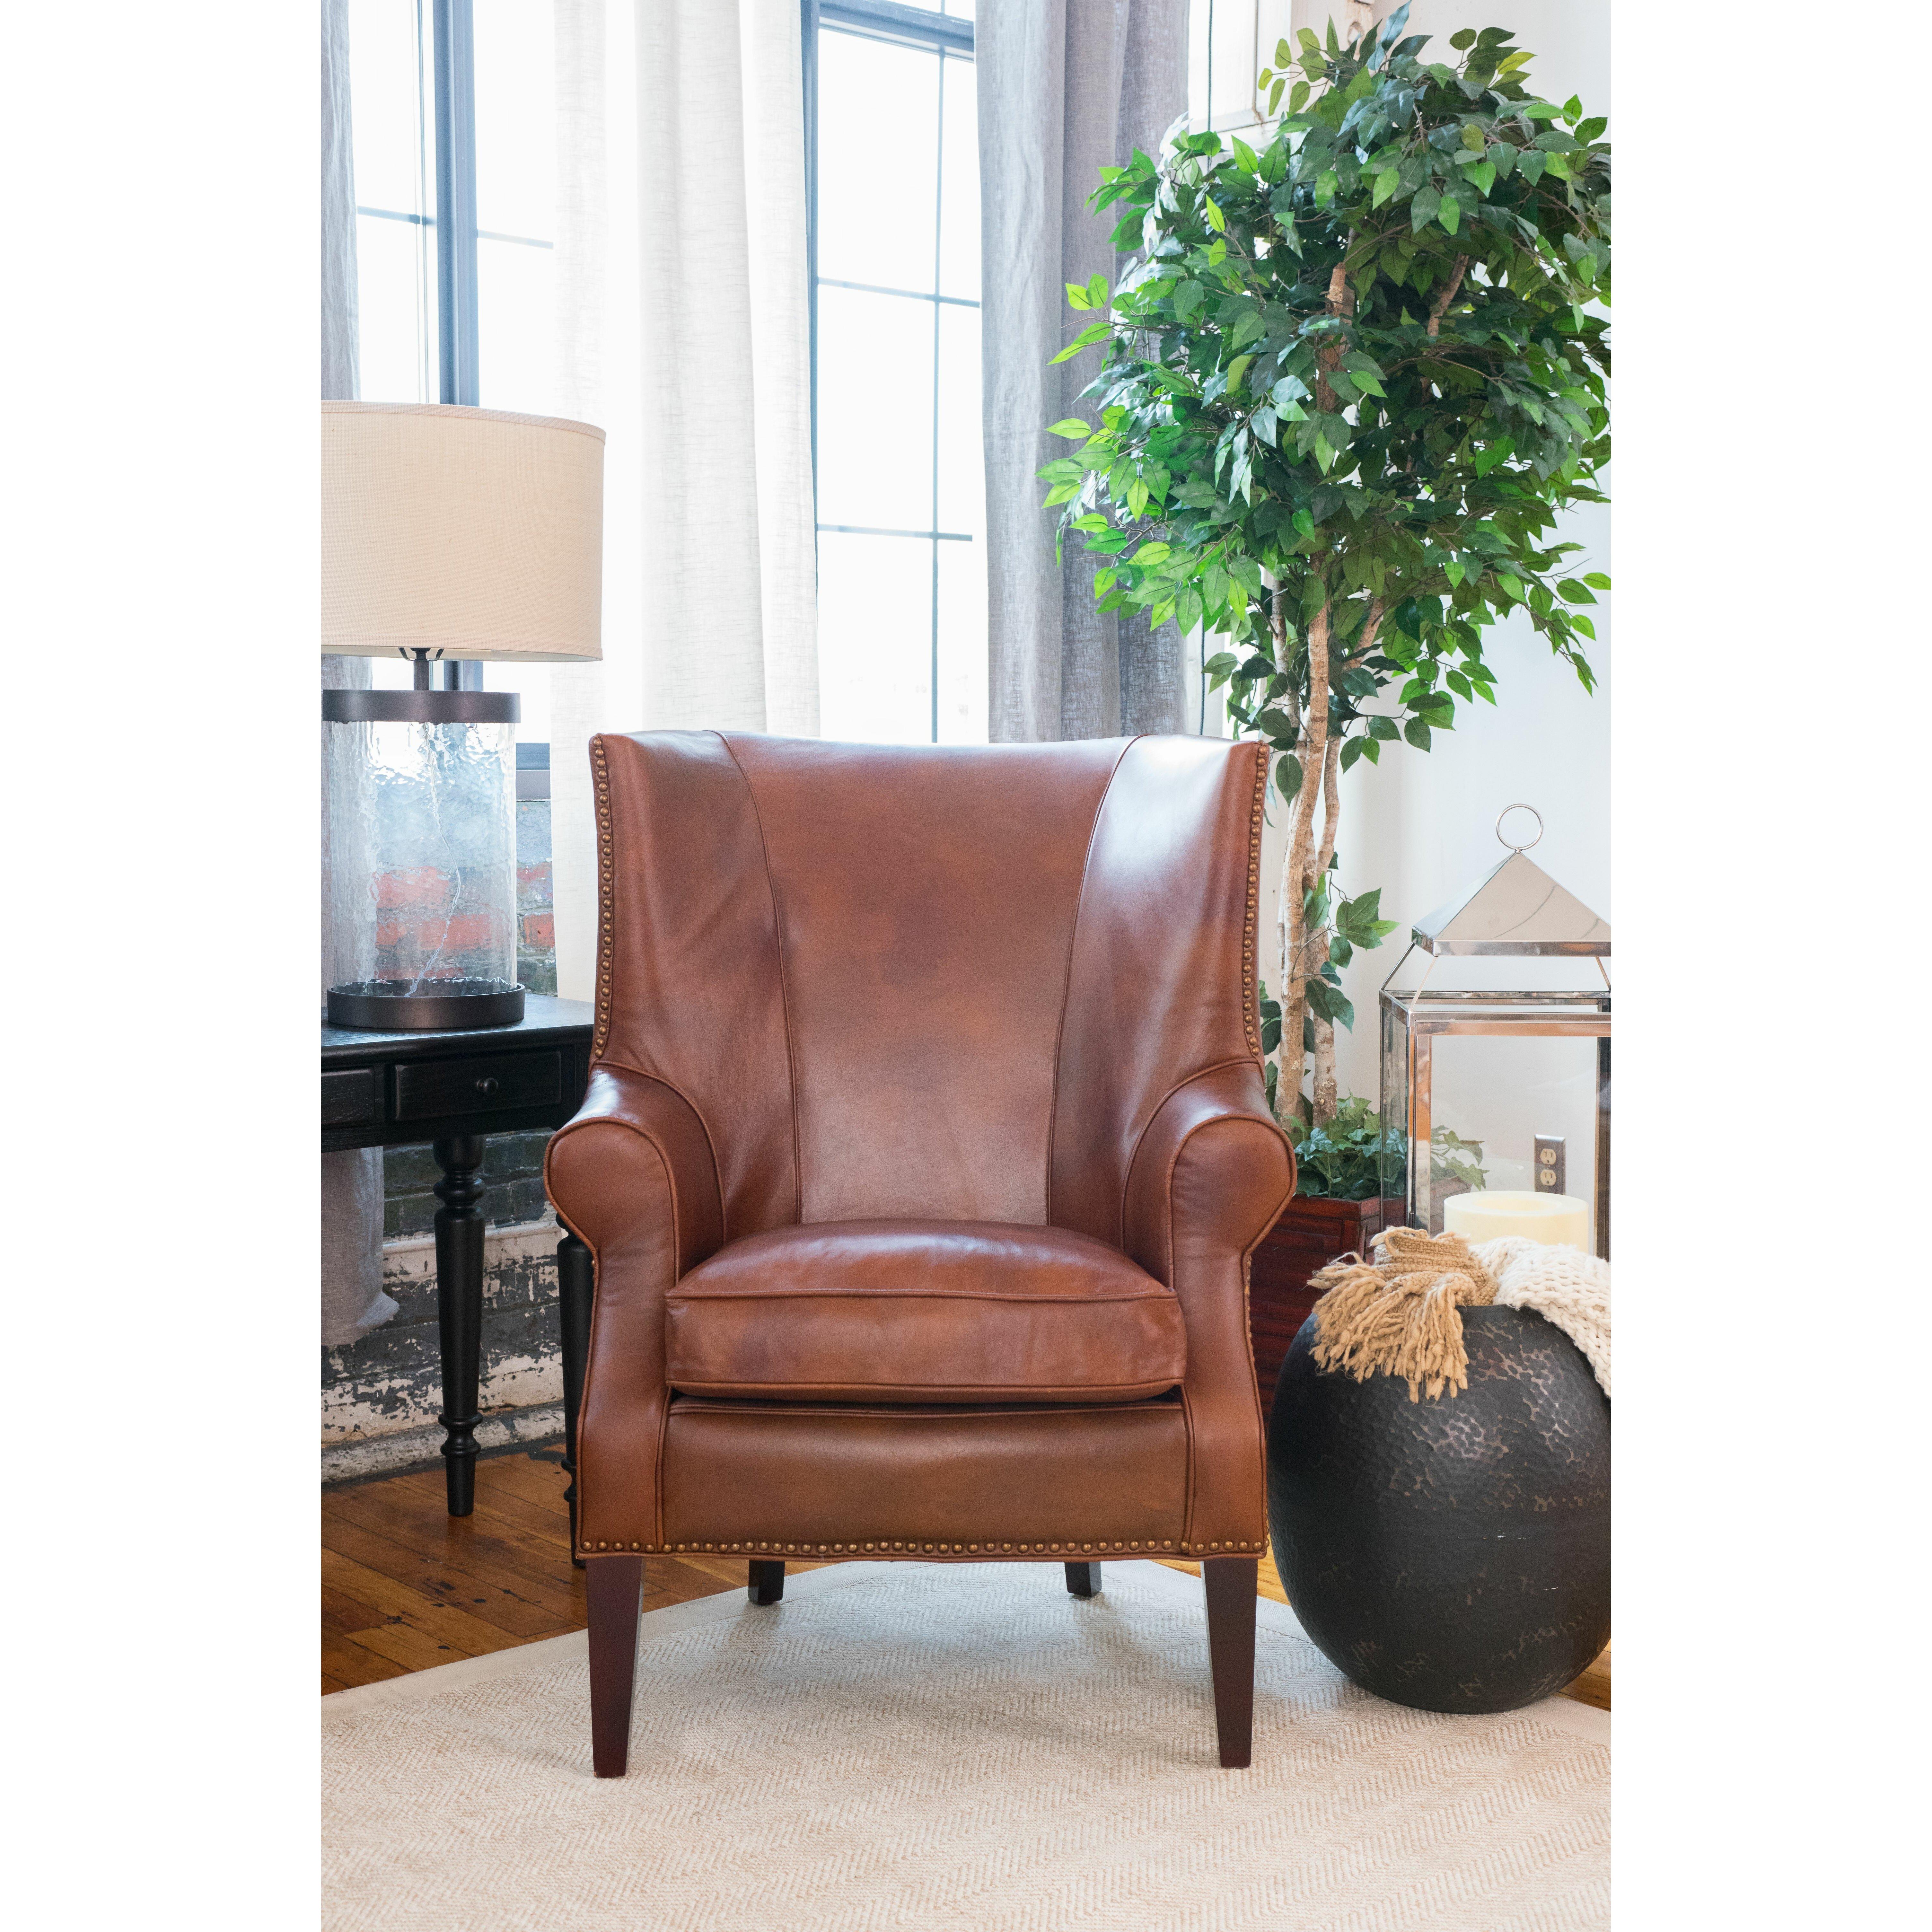 Brayden Leather Wingback Chair | Wayfair